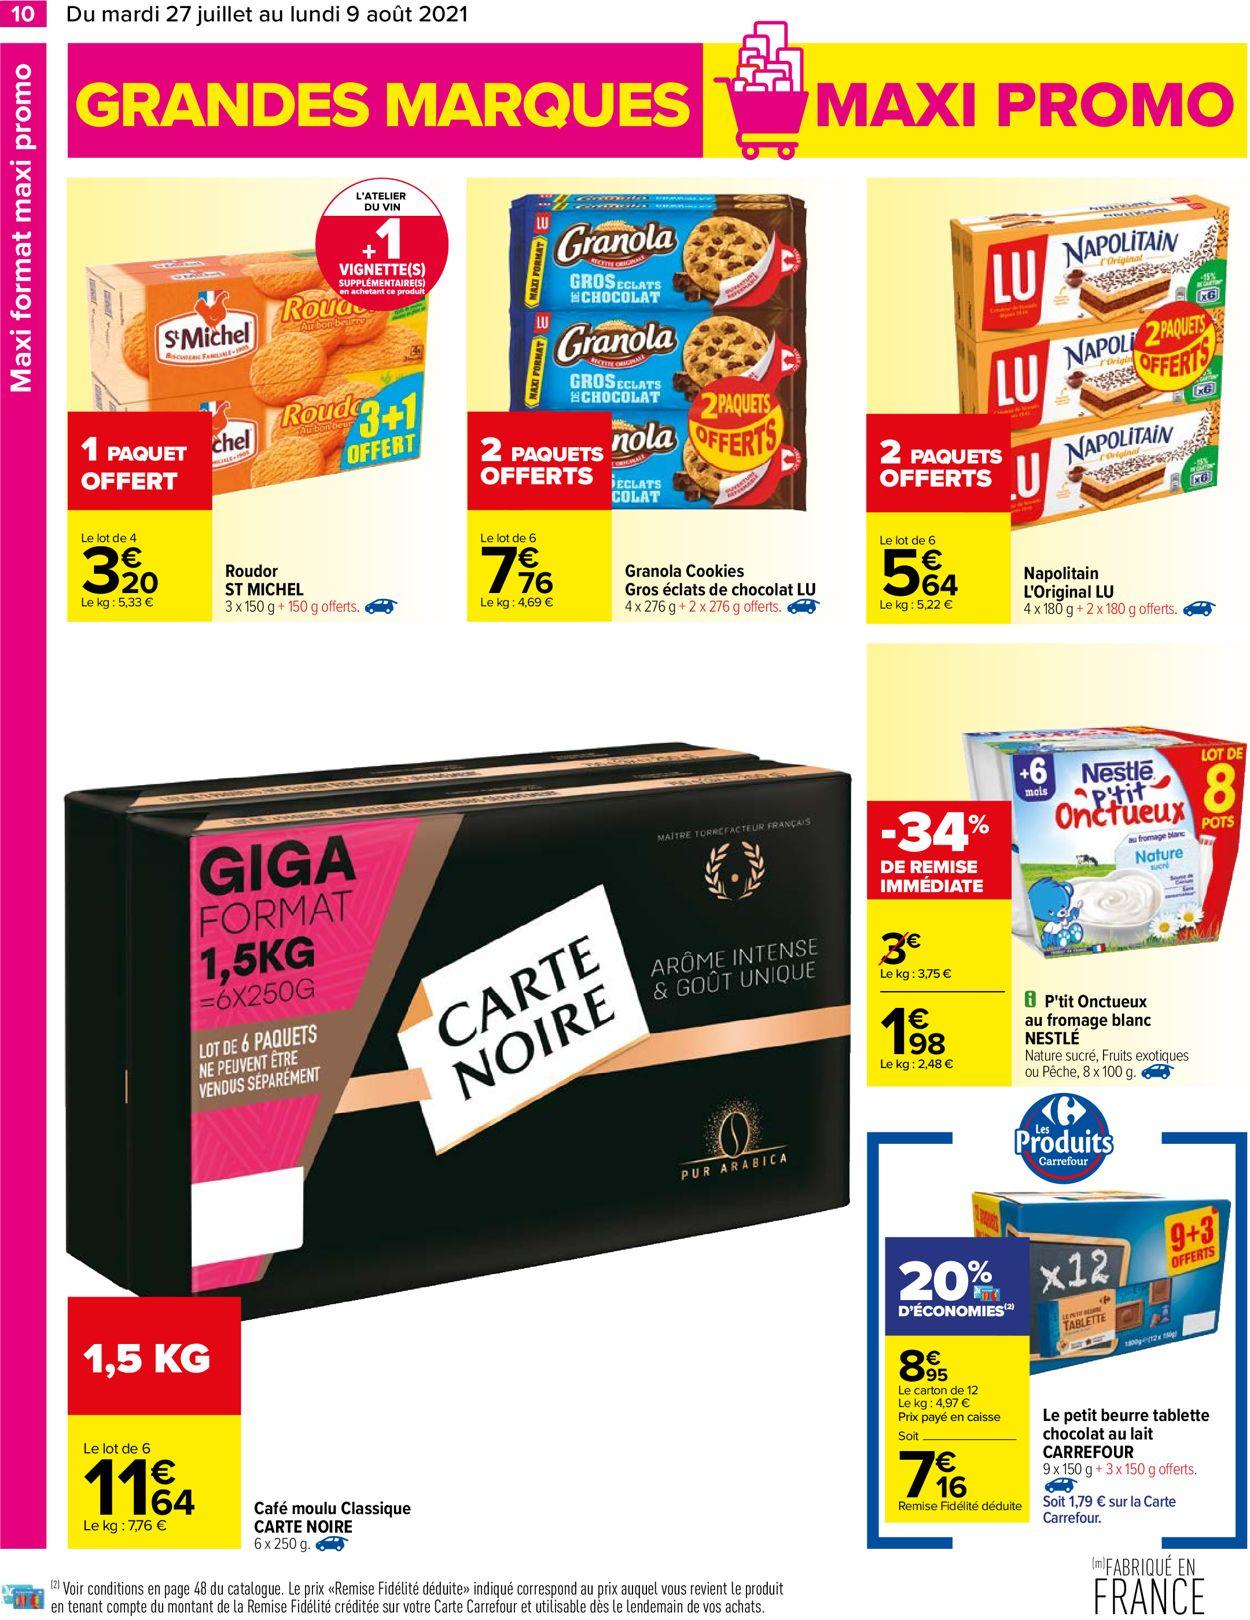 Carrefour Catalogue - 27.07-09.08.2021 (Page 10)